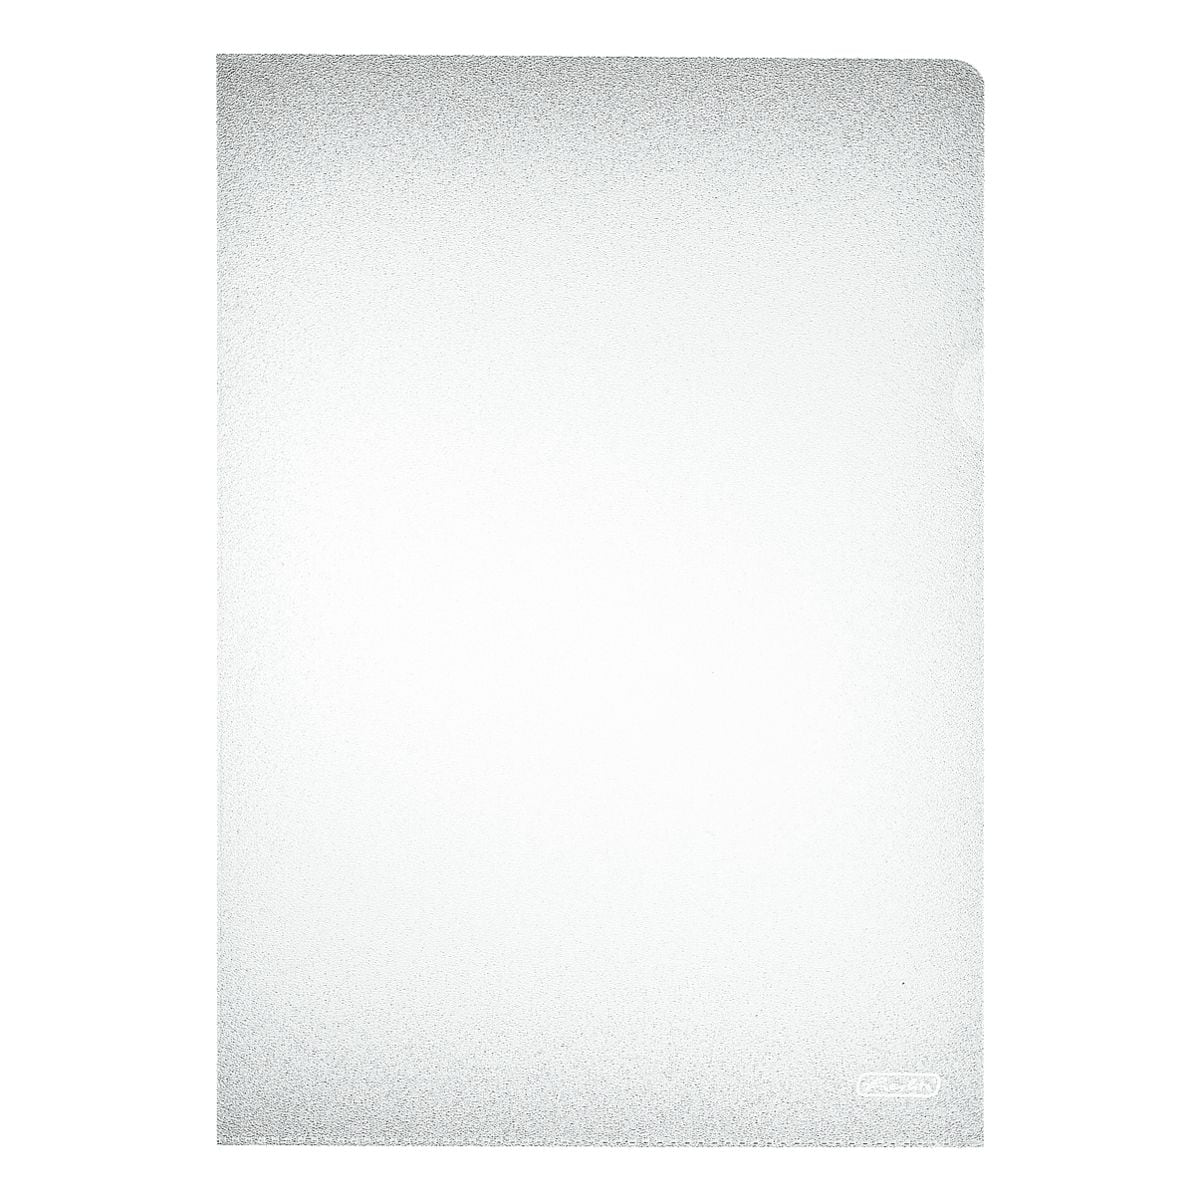 Herlitz Sichthüllen - genarbt (0.09 µ)